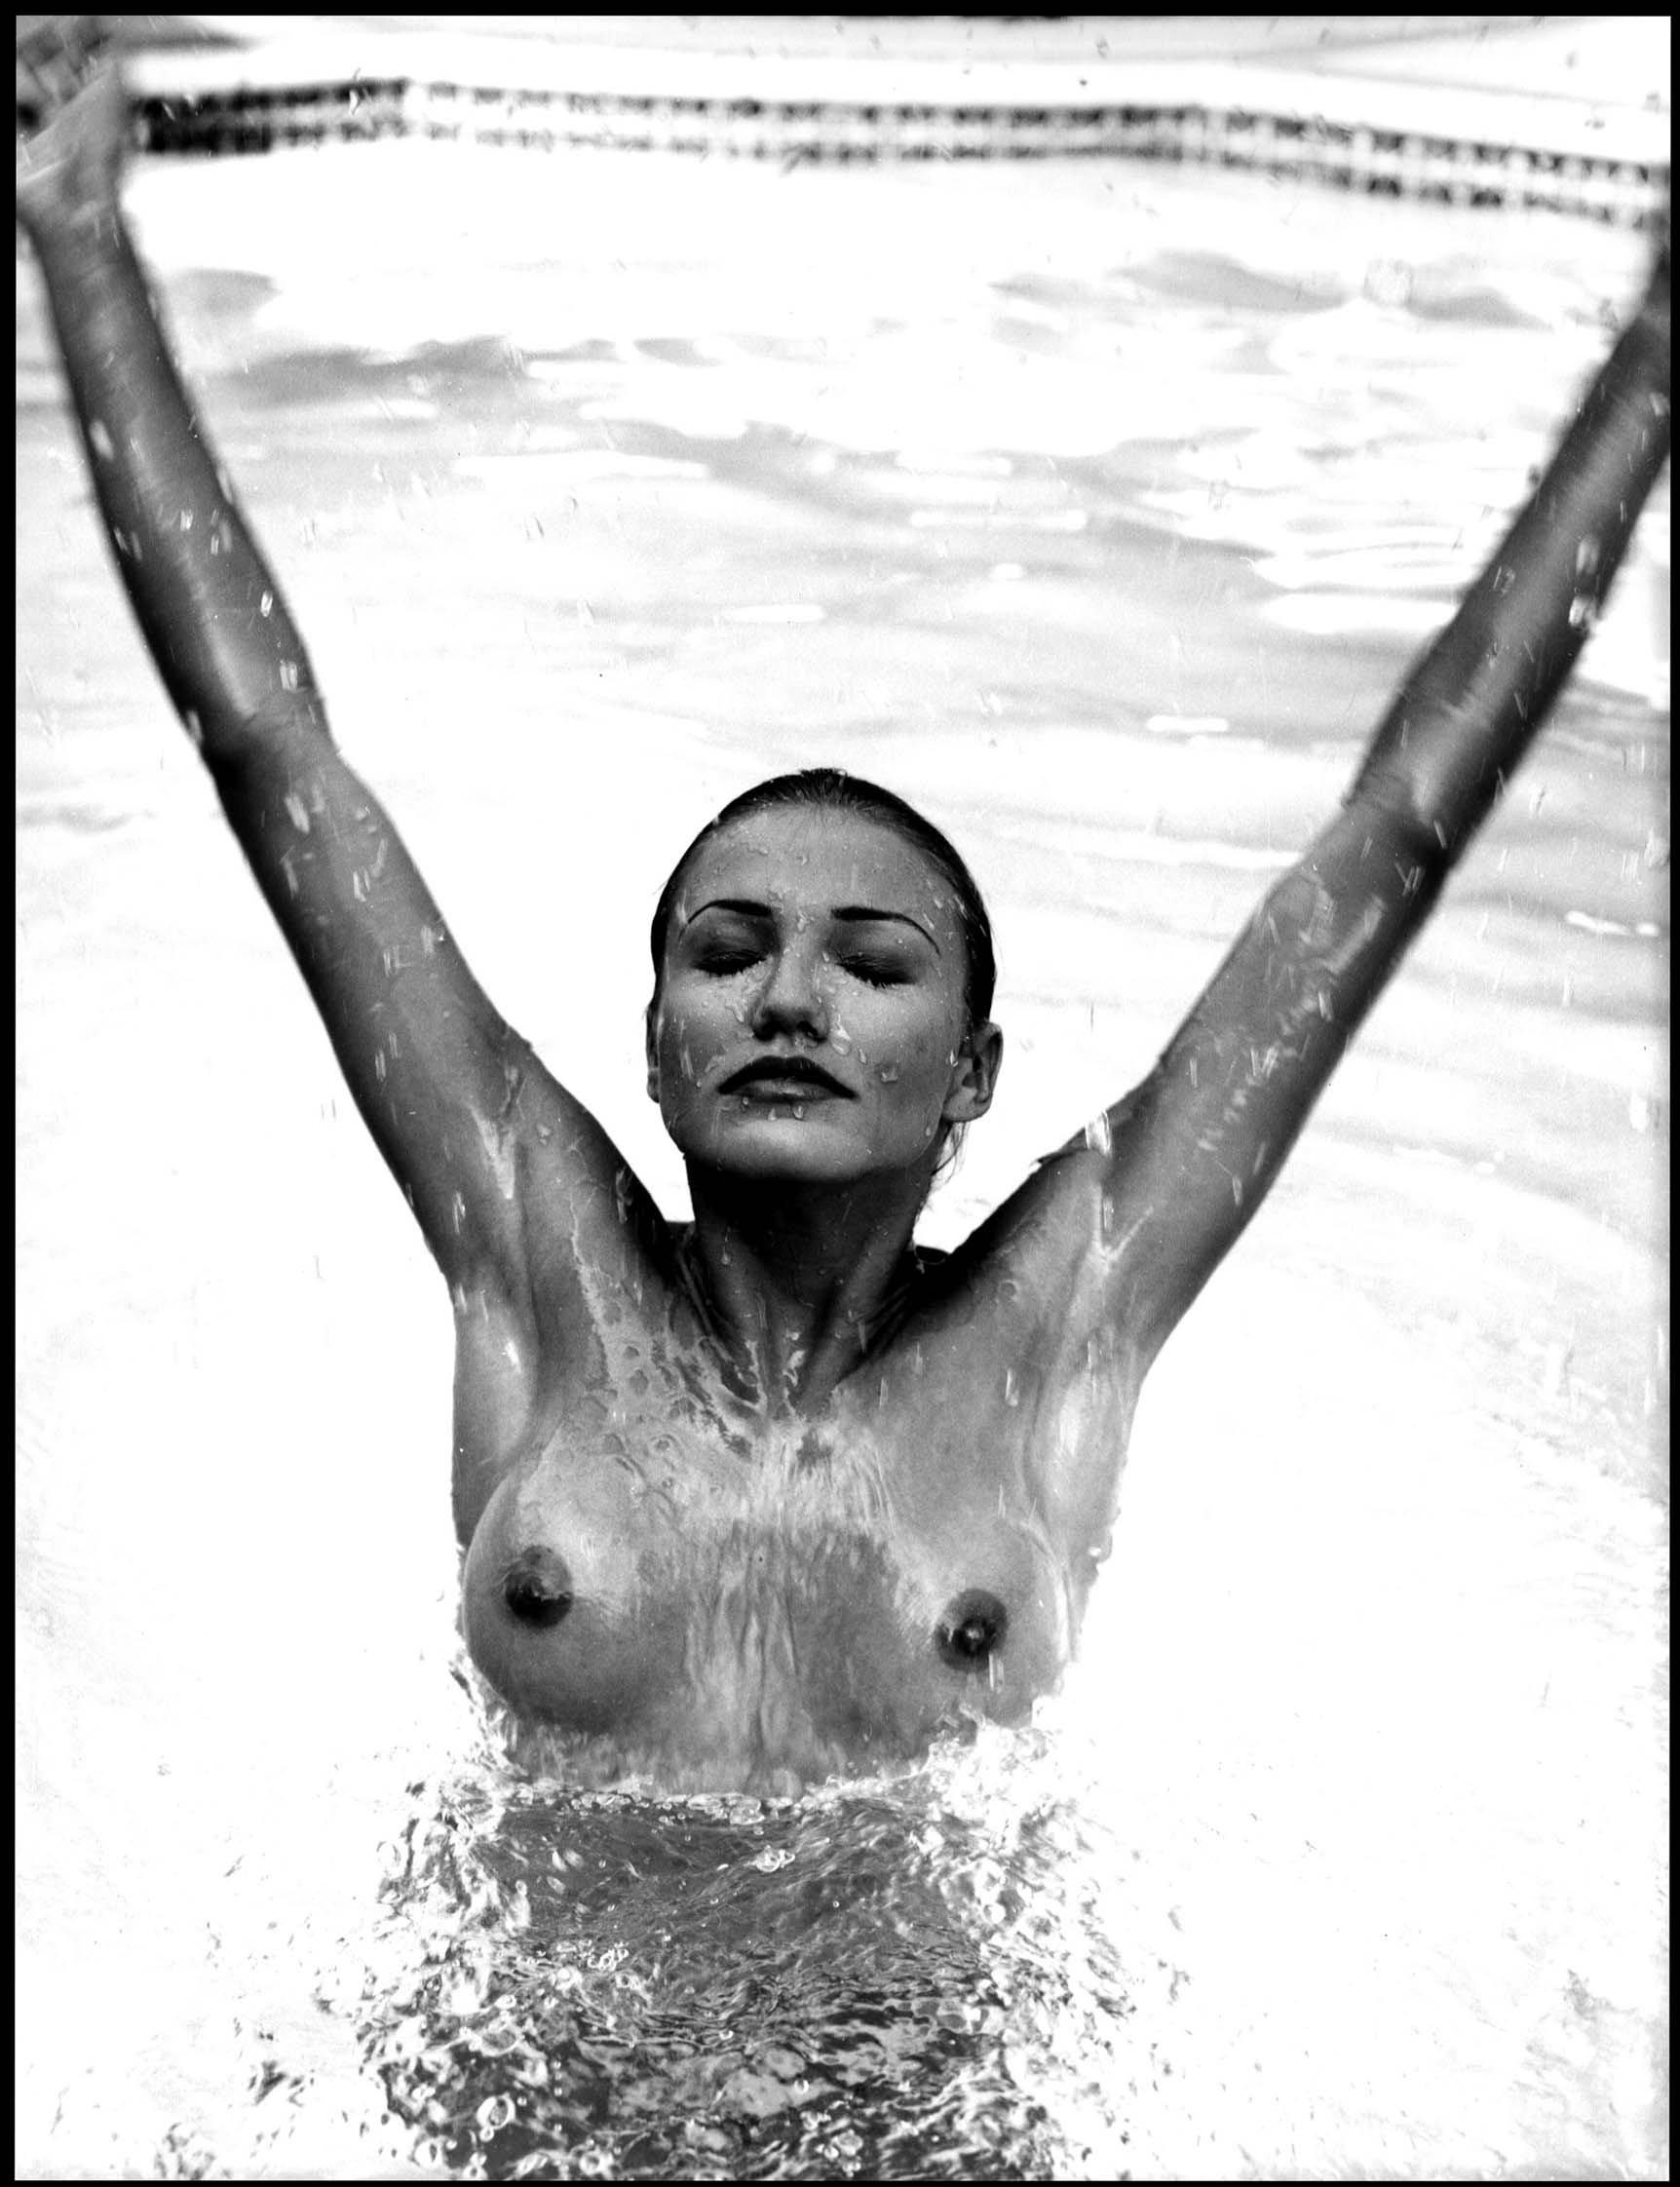 Nude costa rica girls on beach